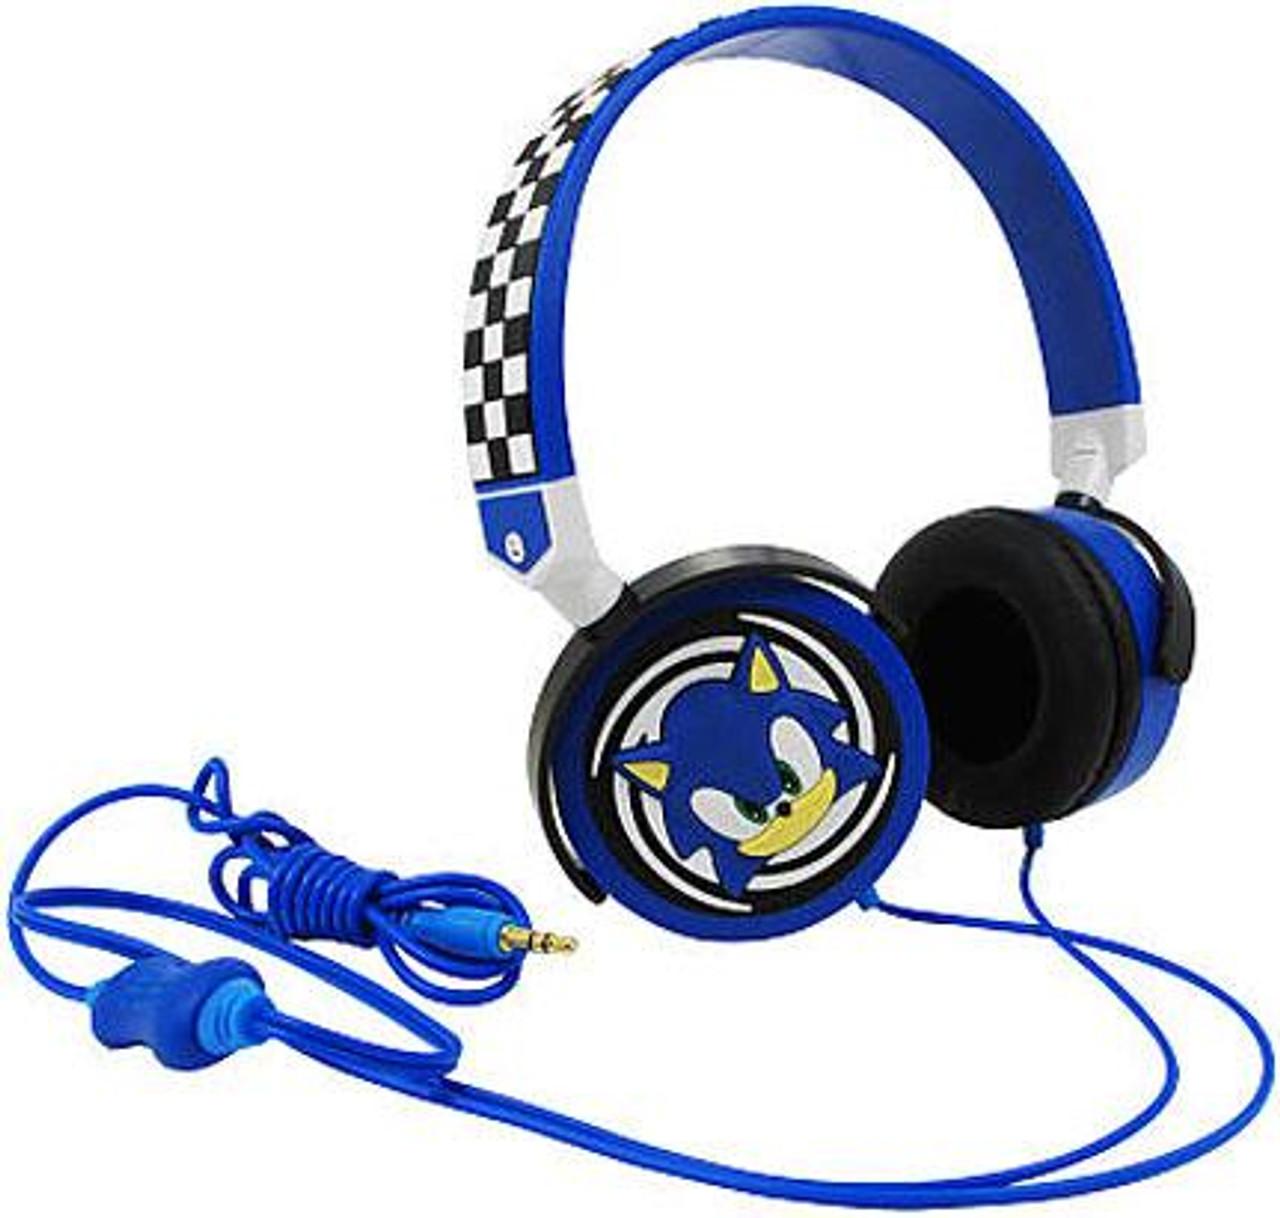 Sonic The Hedgehog Multi-Device Stereo Headphones